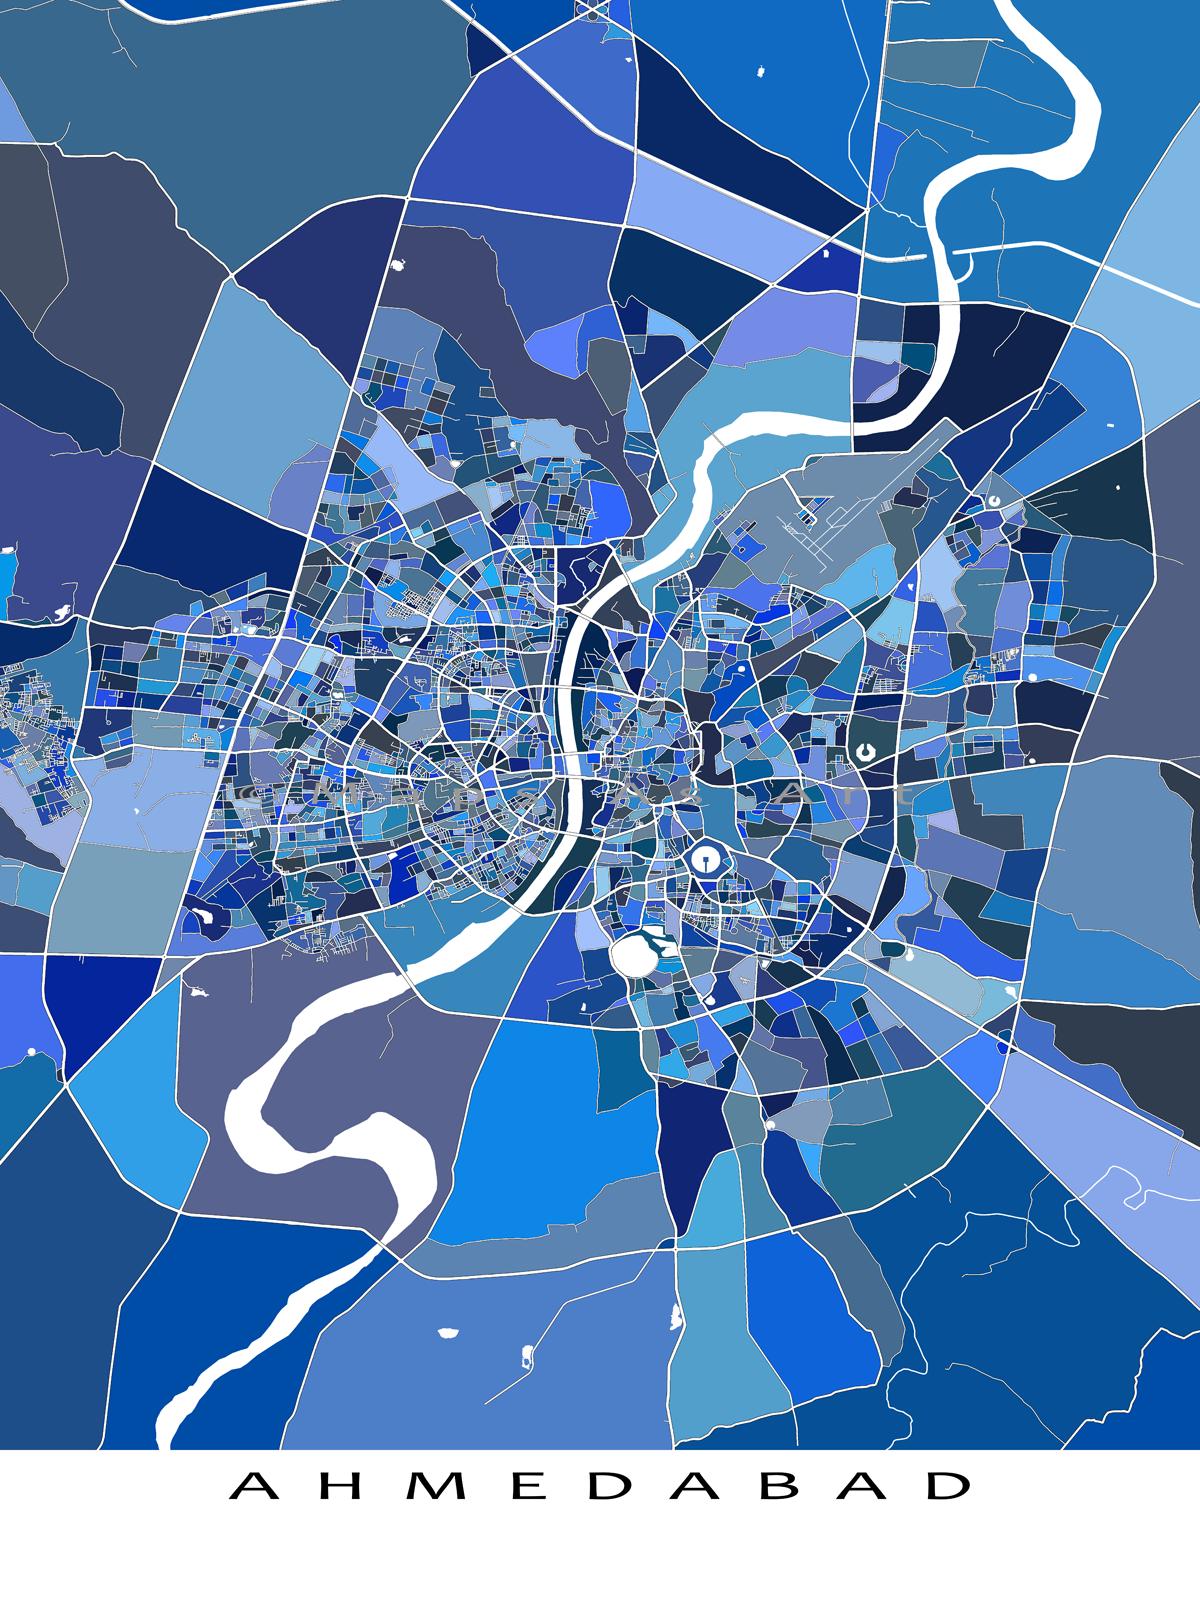 Ahmedabad Map Art Print India Blue City Street Poster India map